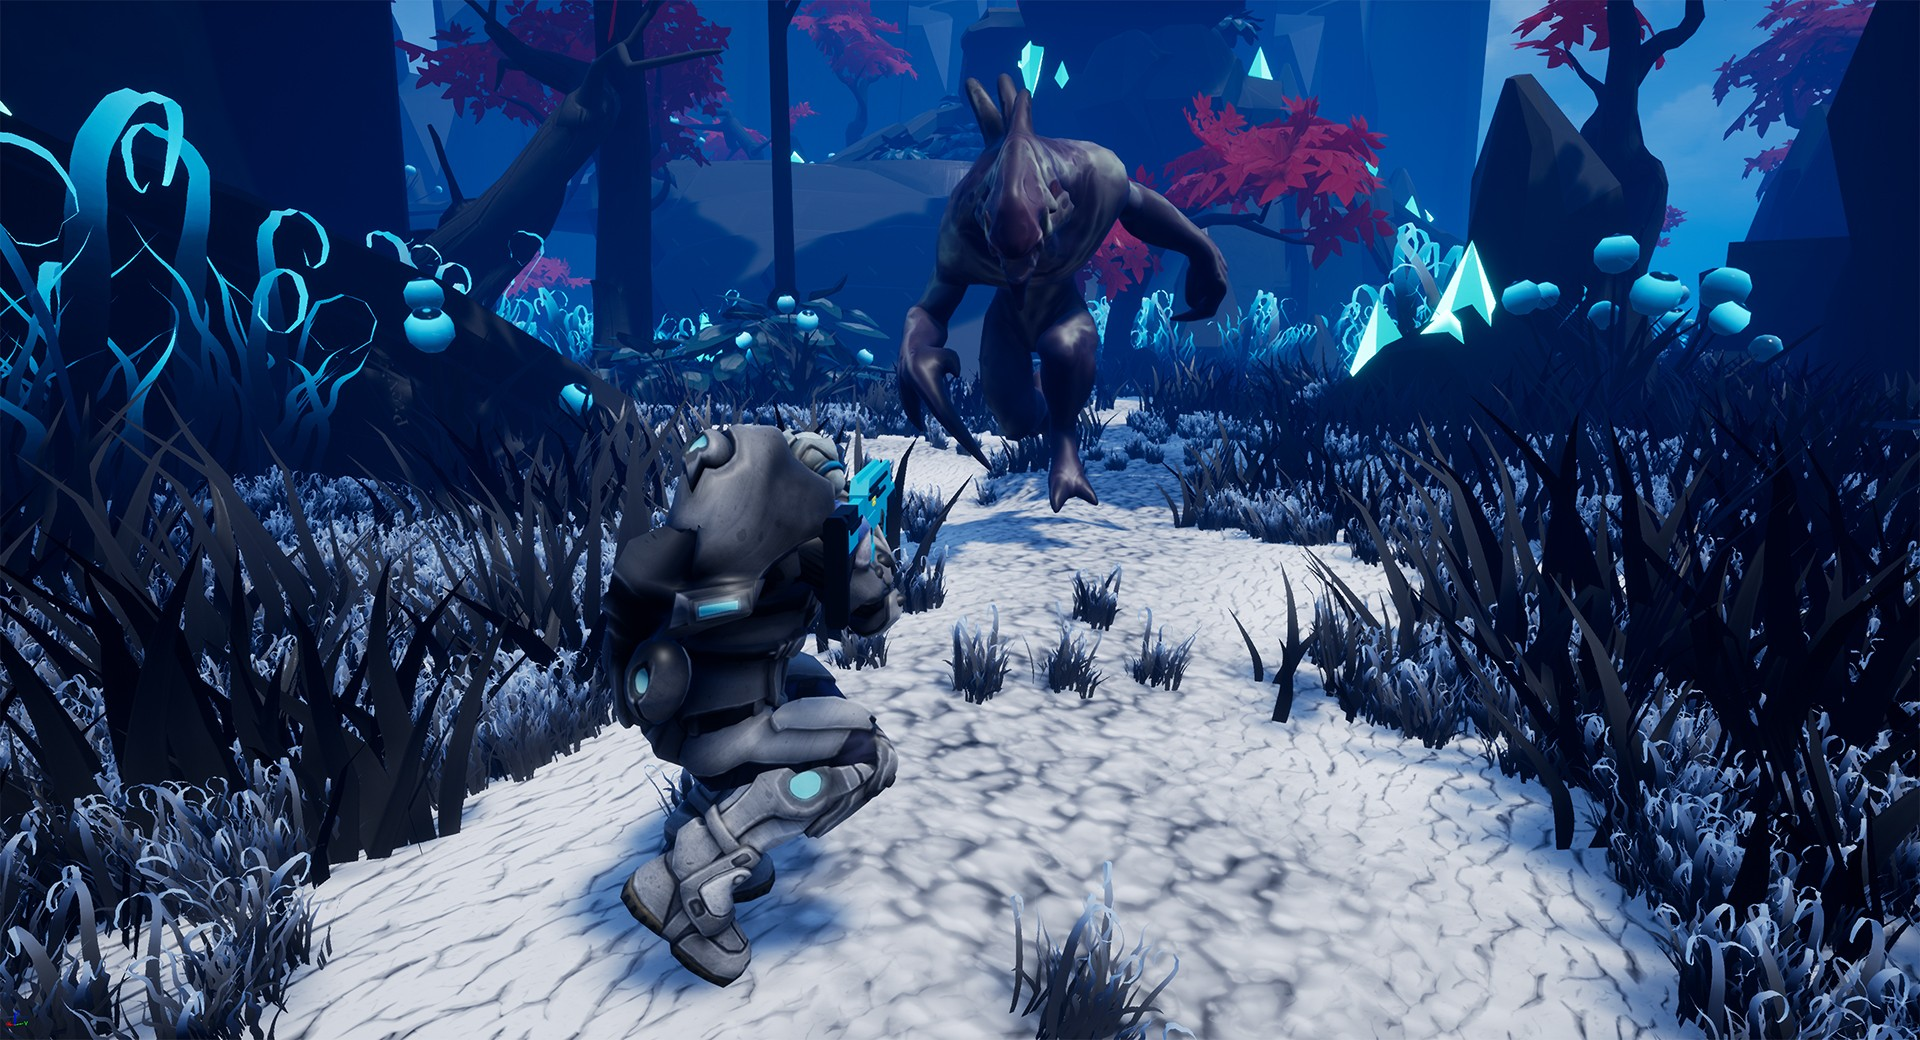 image gameplay3.jpeg